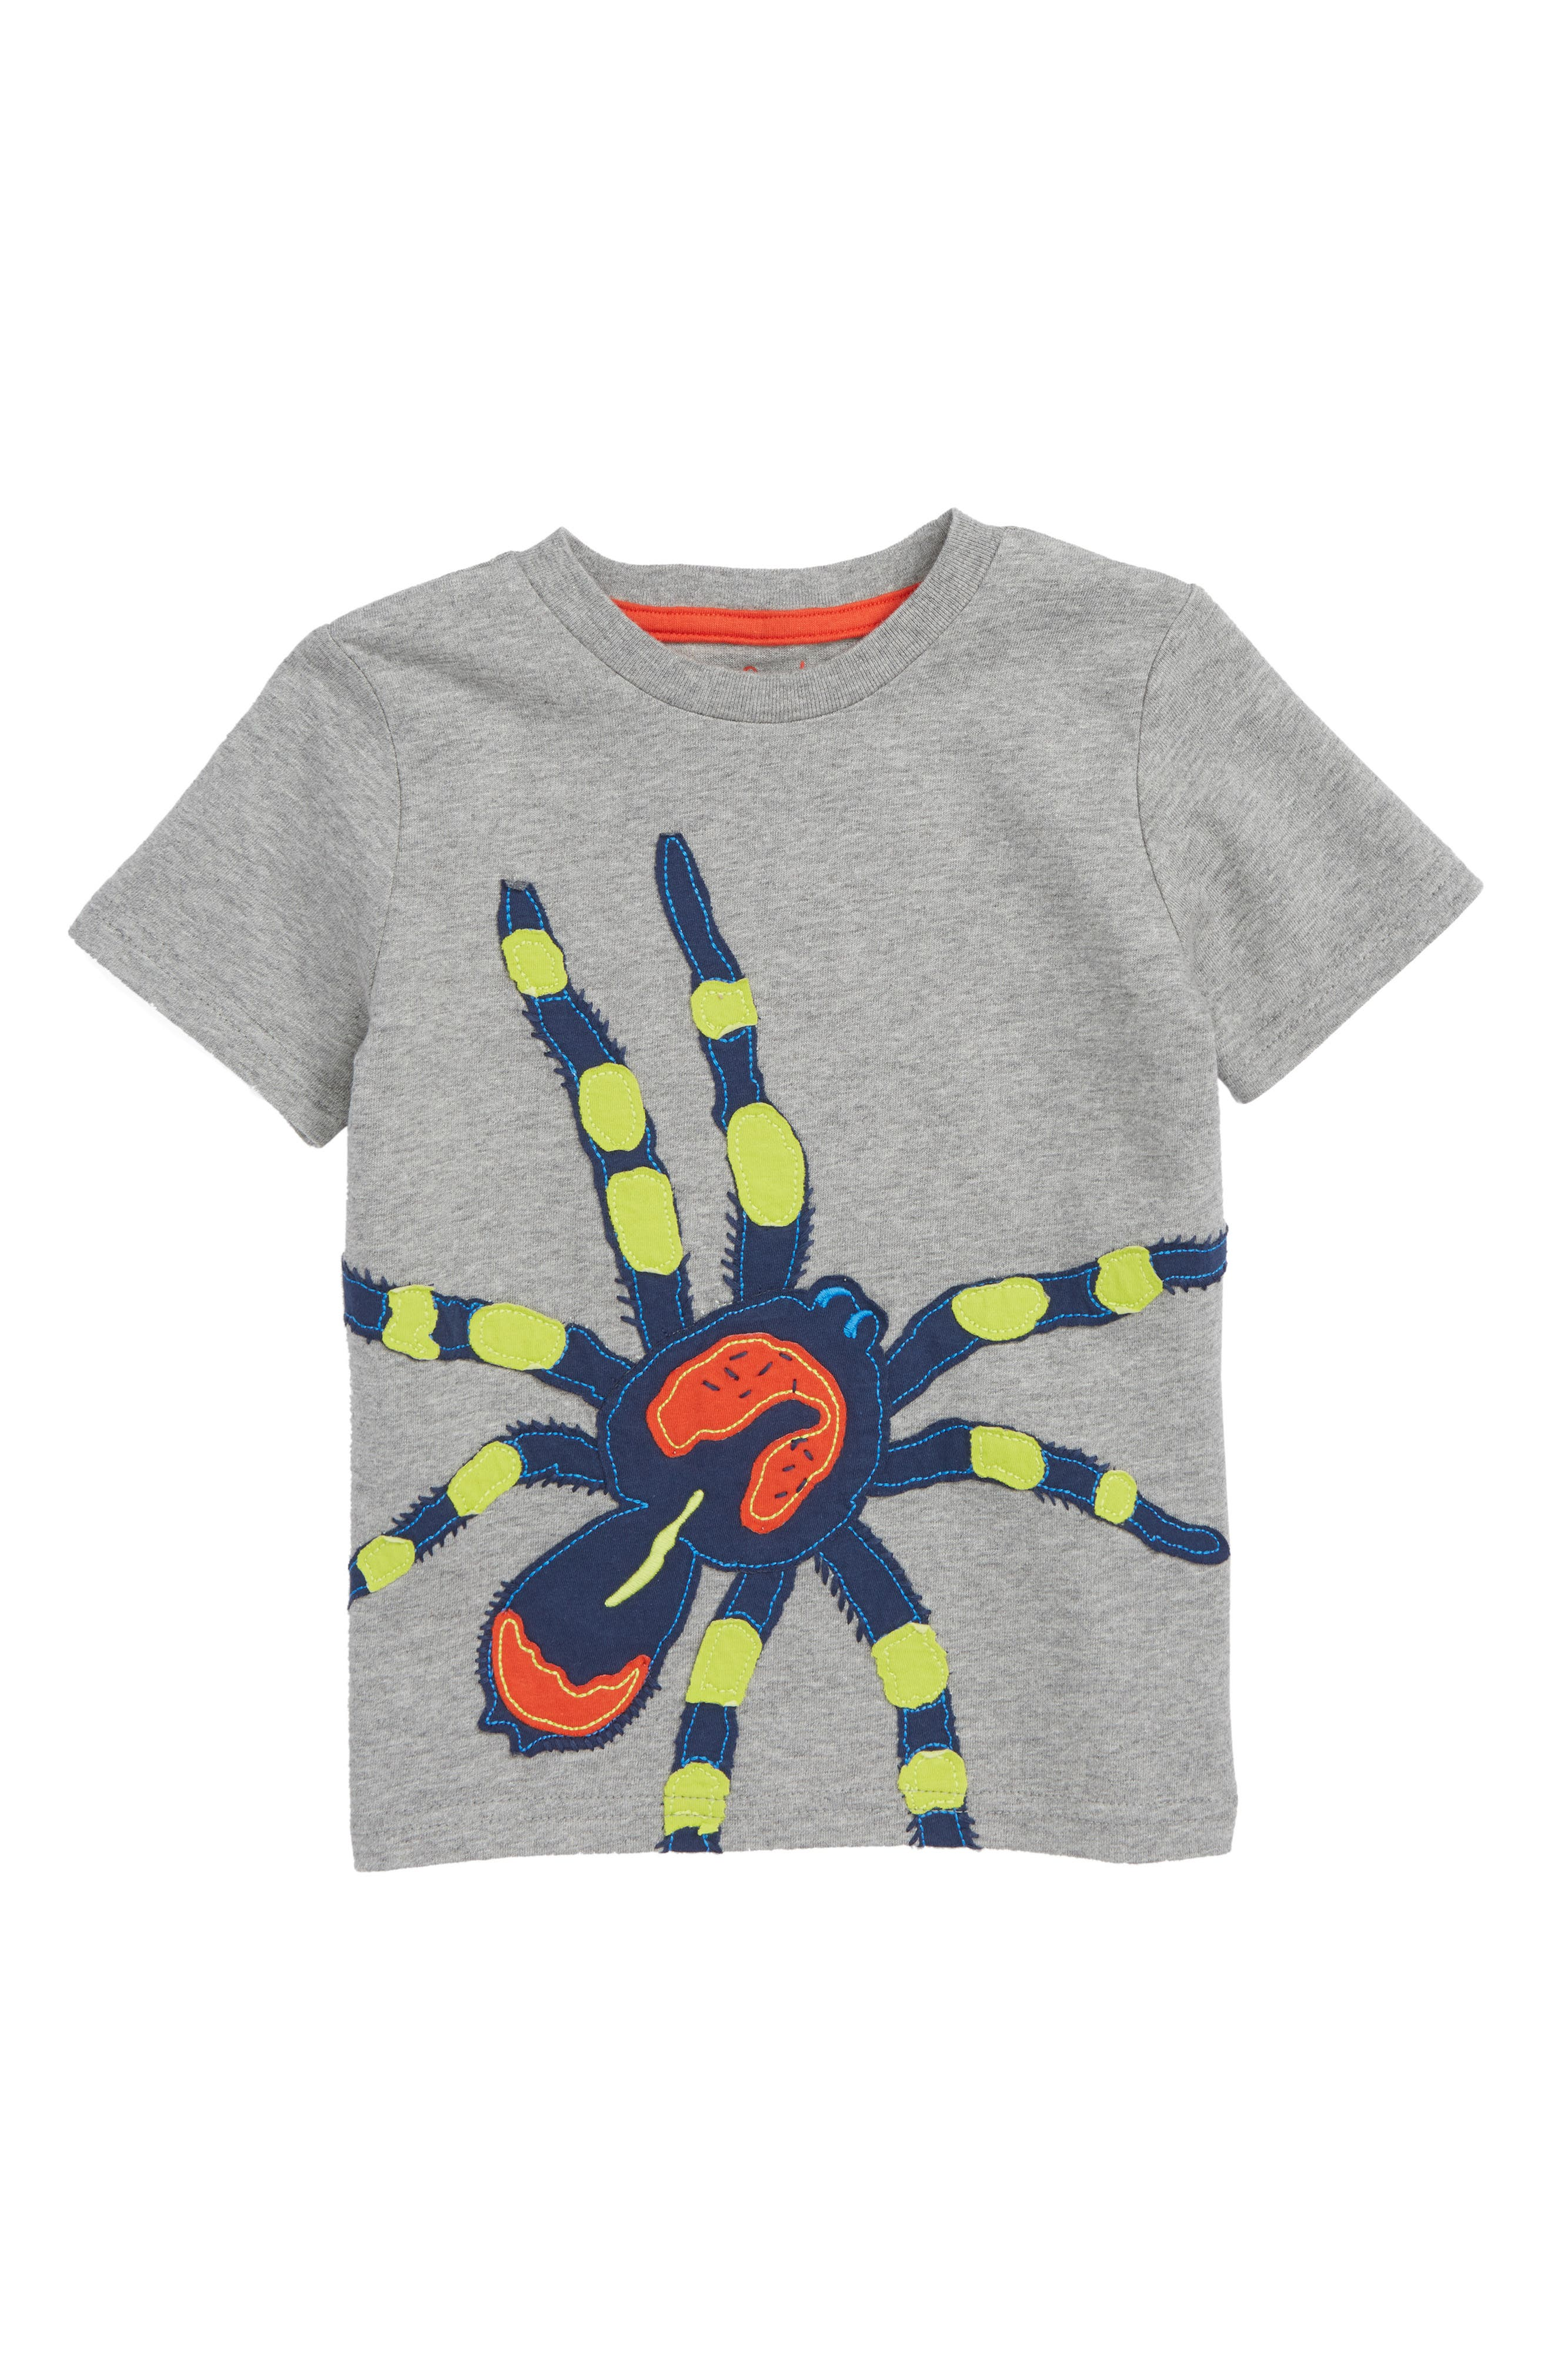 Big Spider Appliqué Shirt,                             Main thumbnail 1, color,                             Charcoal Grey Marl Spider